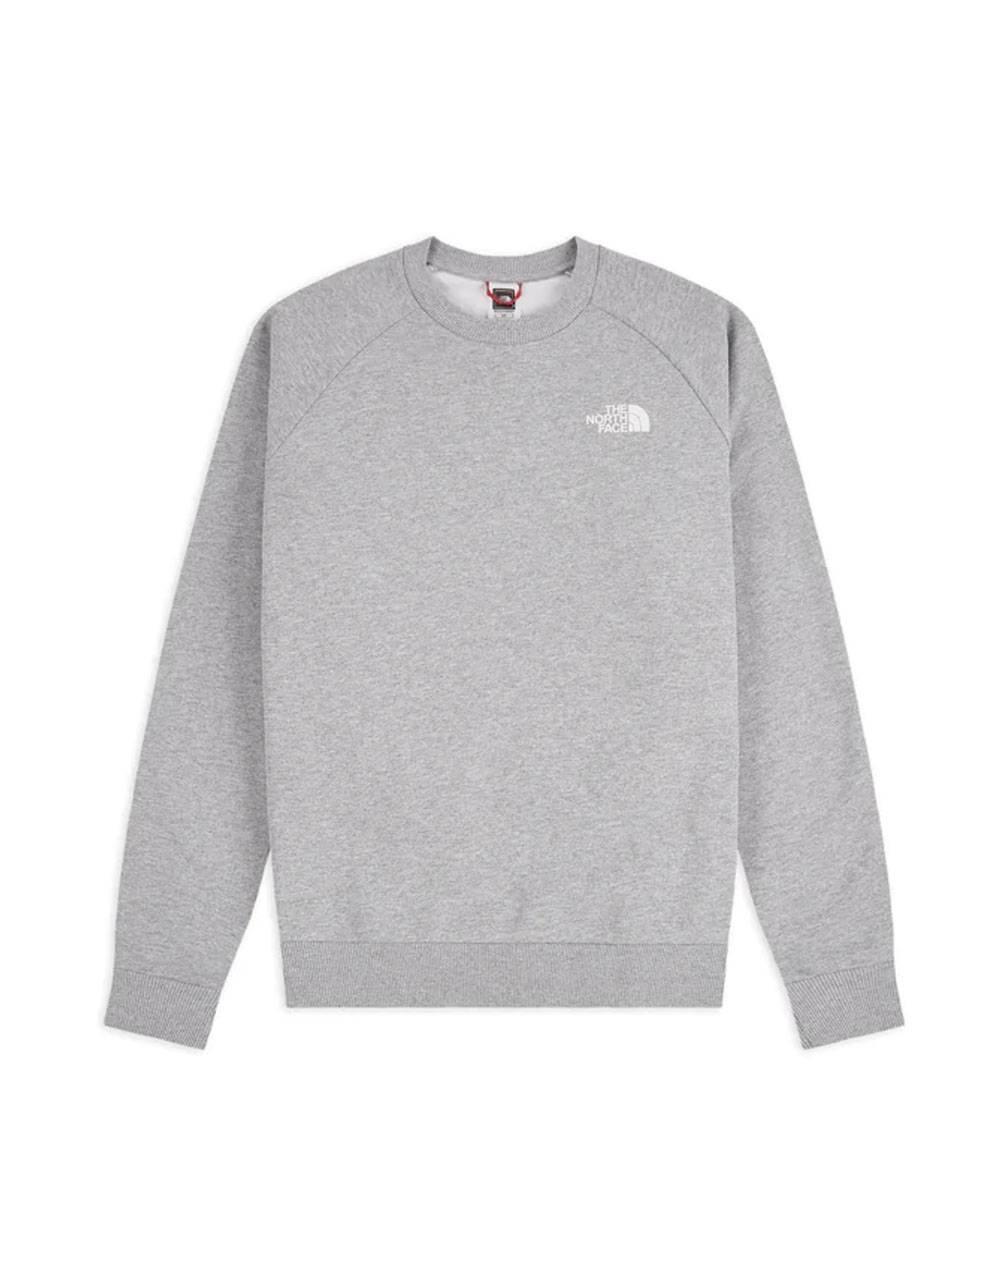 The North Face raglan red box new crewneck sweater - light grey THE NORTH FACE Sweater 75,41€